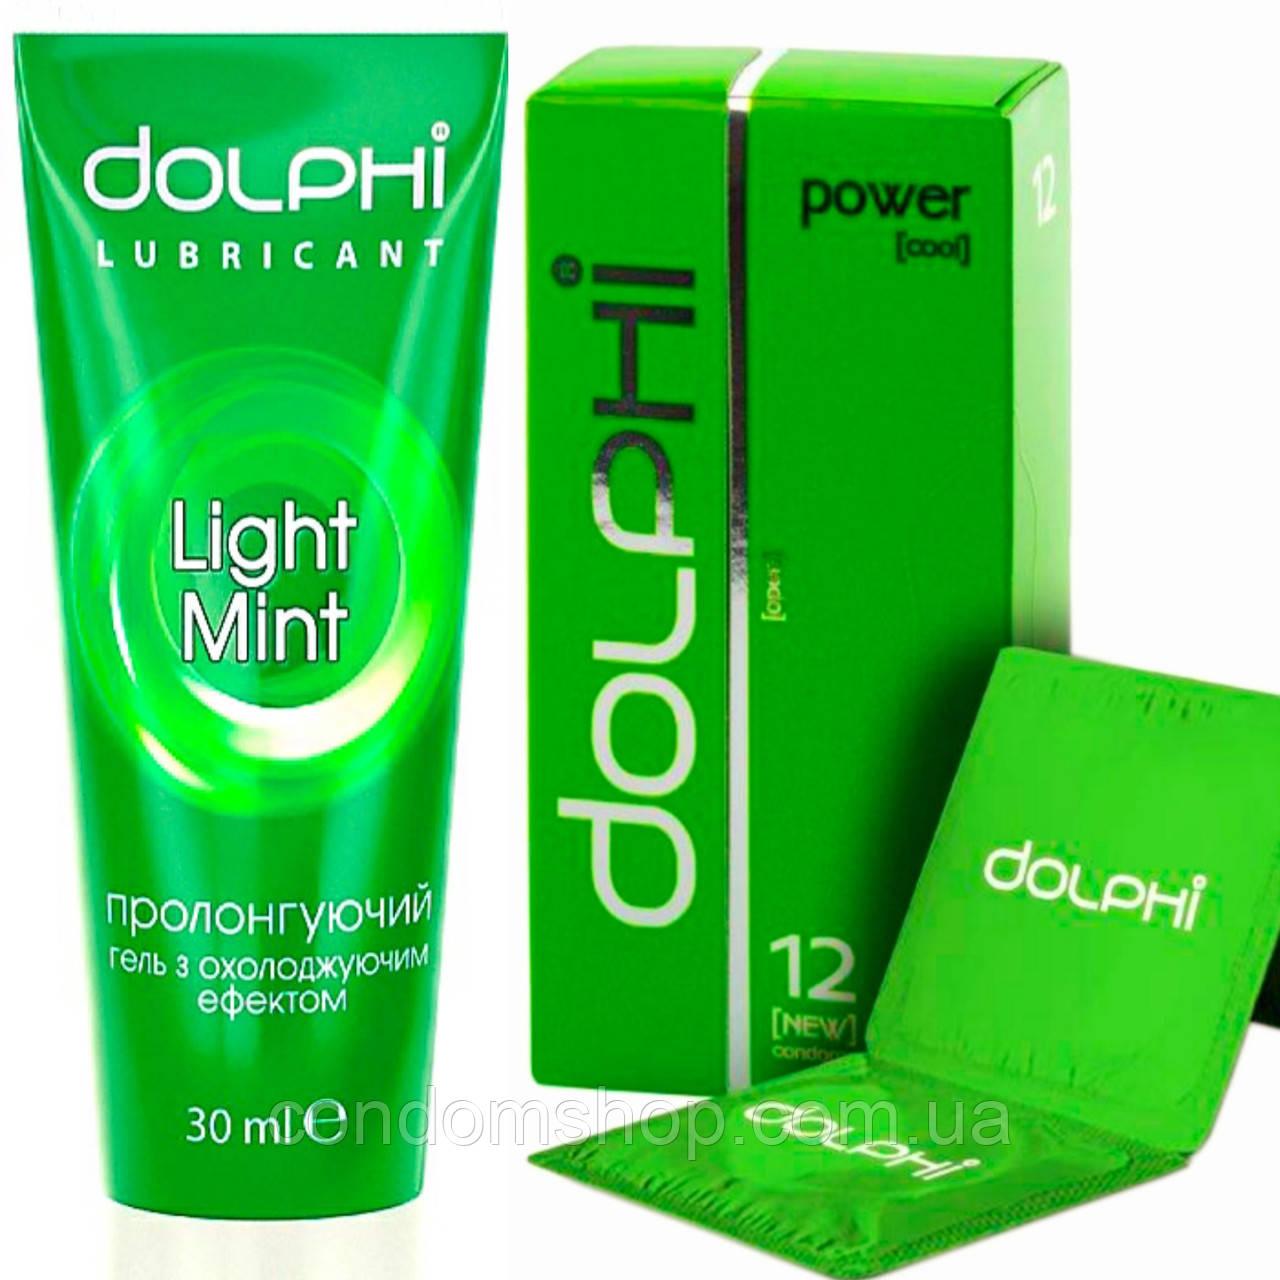 "Набір Dolphi Lux ,,безмежну насолоду"":презервативи Dolphi Power (long love)+гель-змазка Light mint"